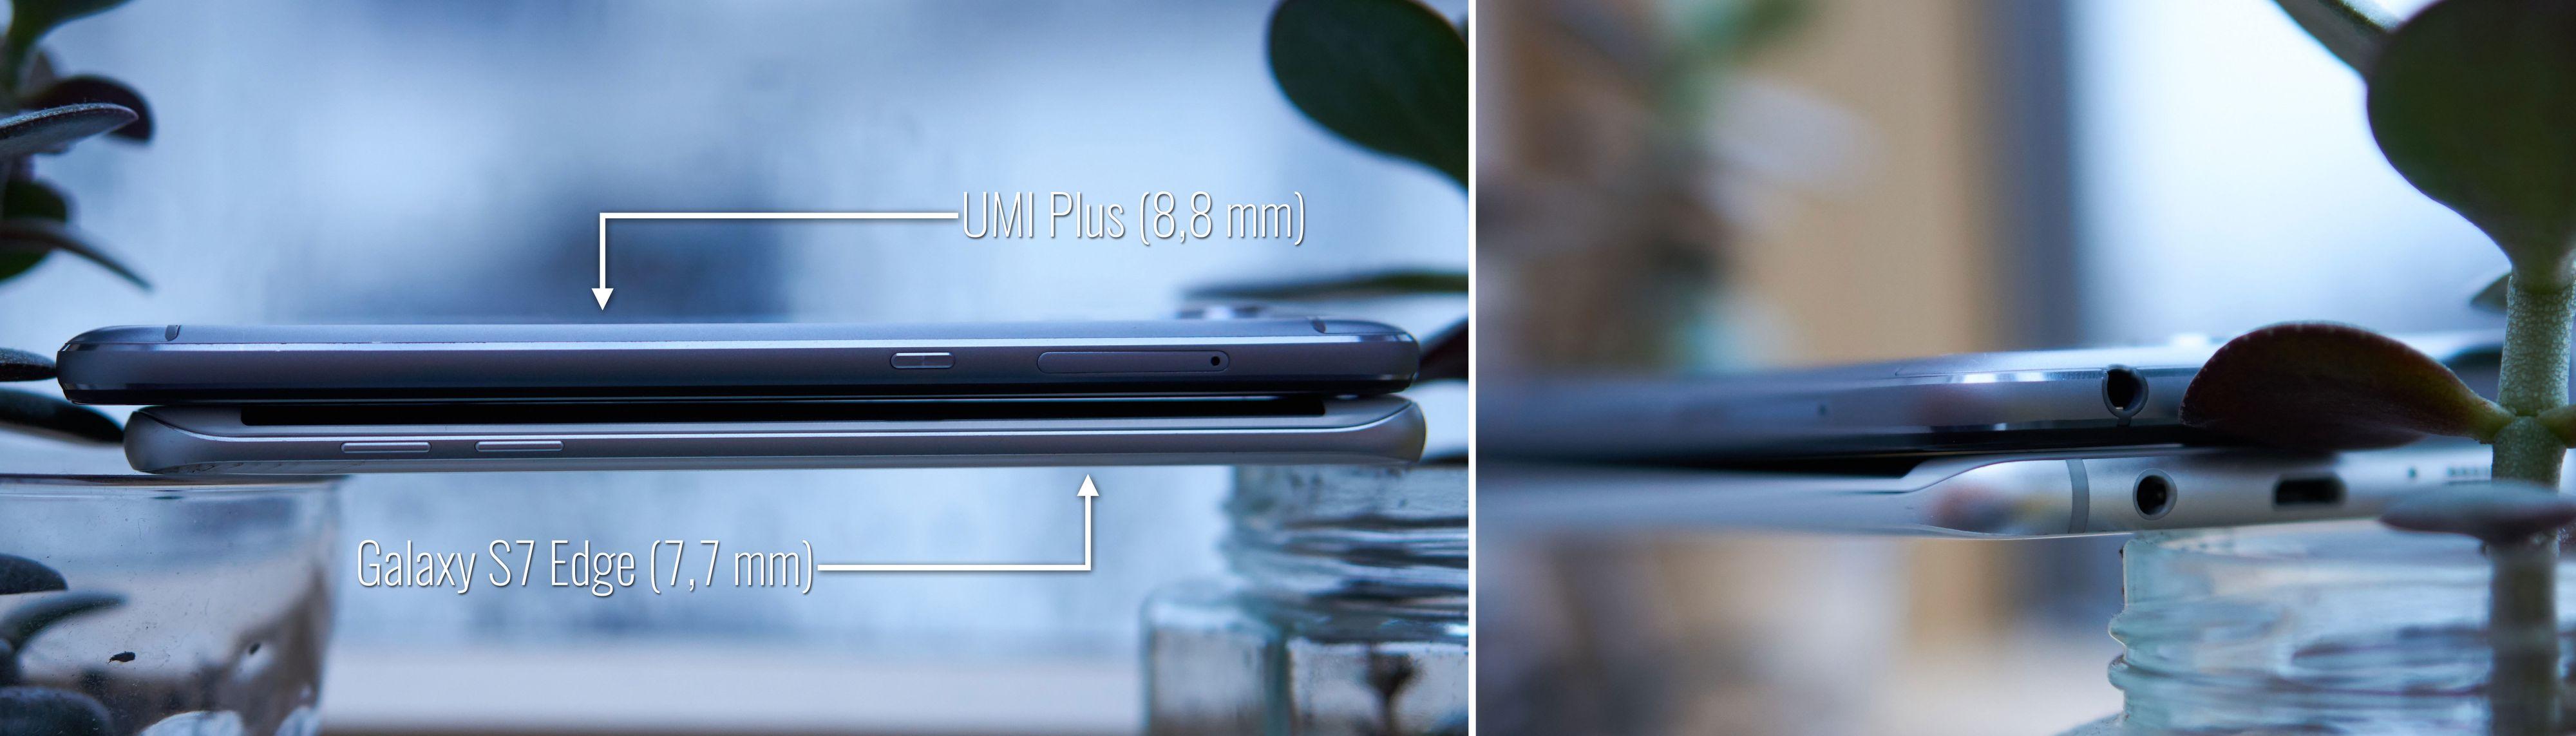 UMi Plus sammenlignet med Galaxy S7 Edge.